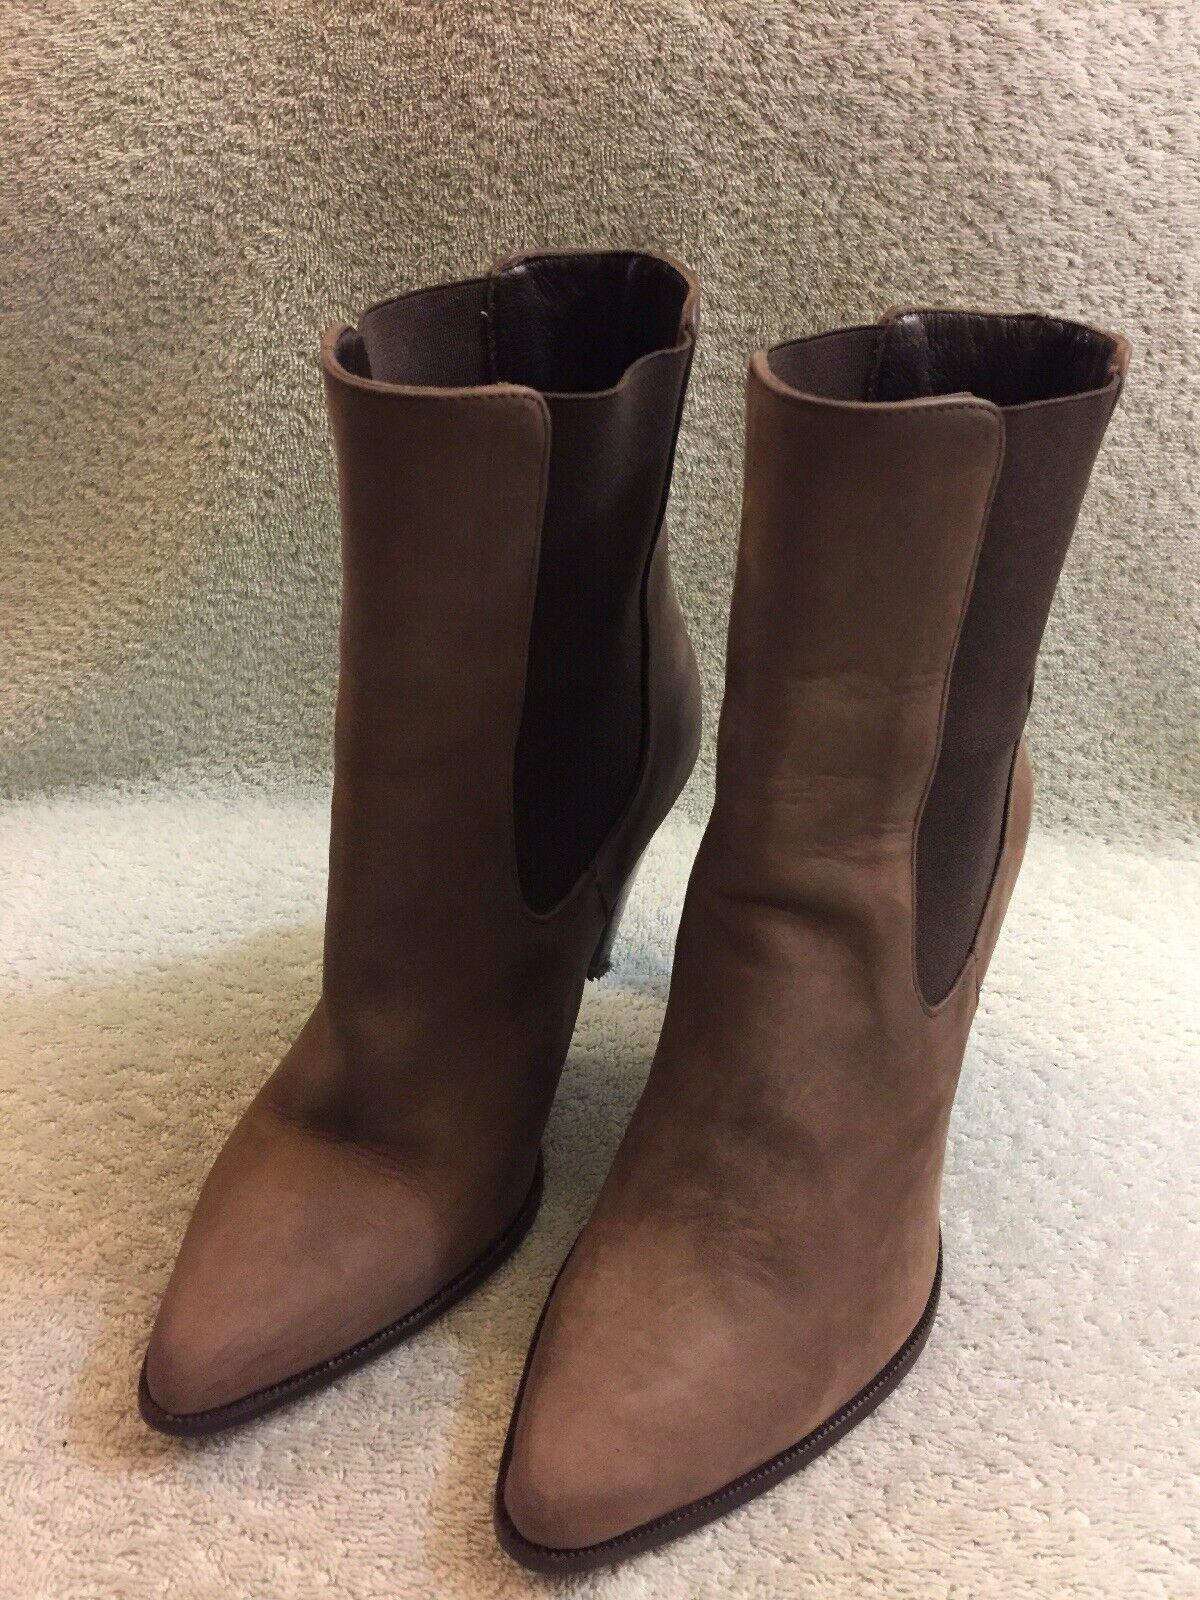 Jenni Kayne Chelsea Ankle Brown Boots Women's Sz 36 6